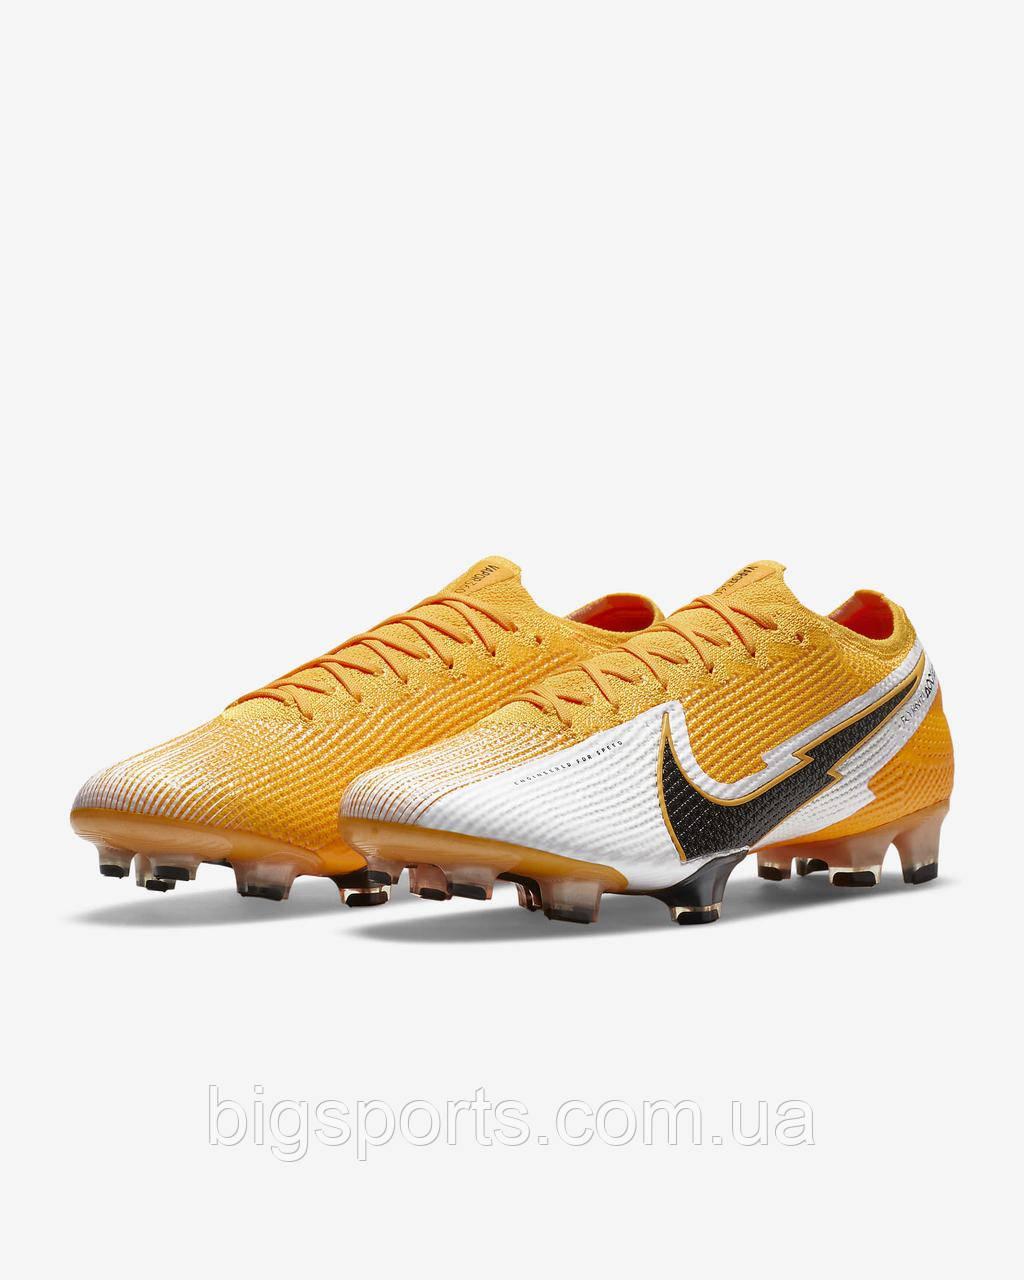 Бутсы футбольные муж. Nike Mercurial Vapor 13 Elite FG (арт. AQ4176-801)